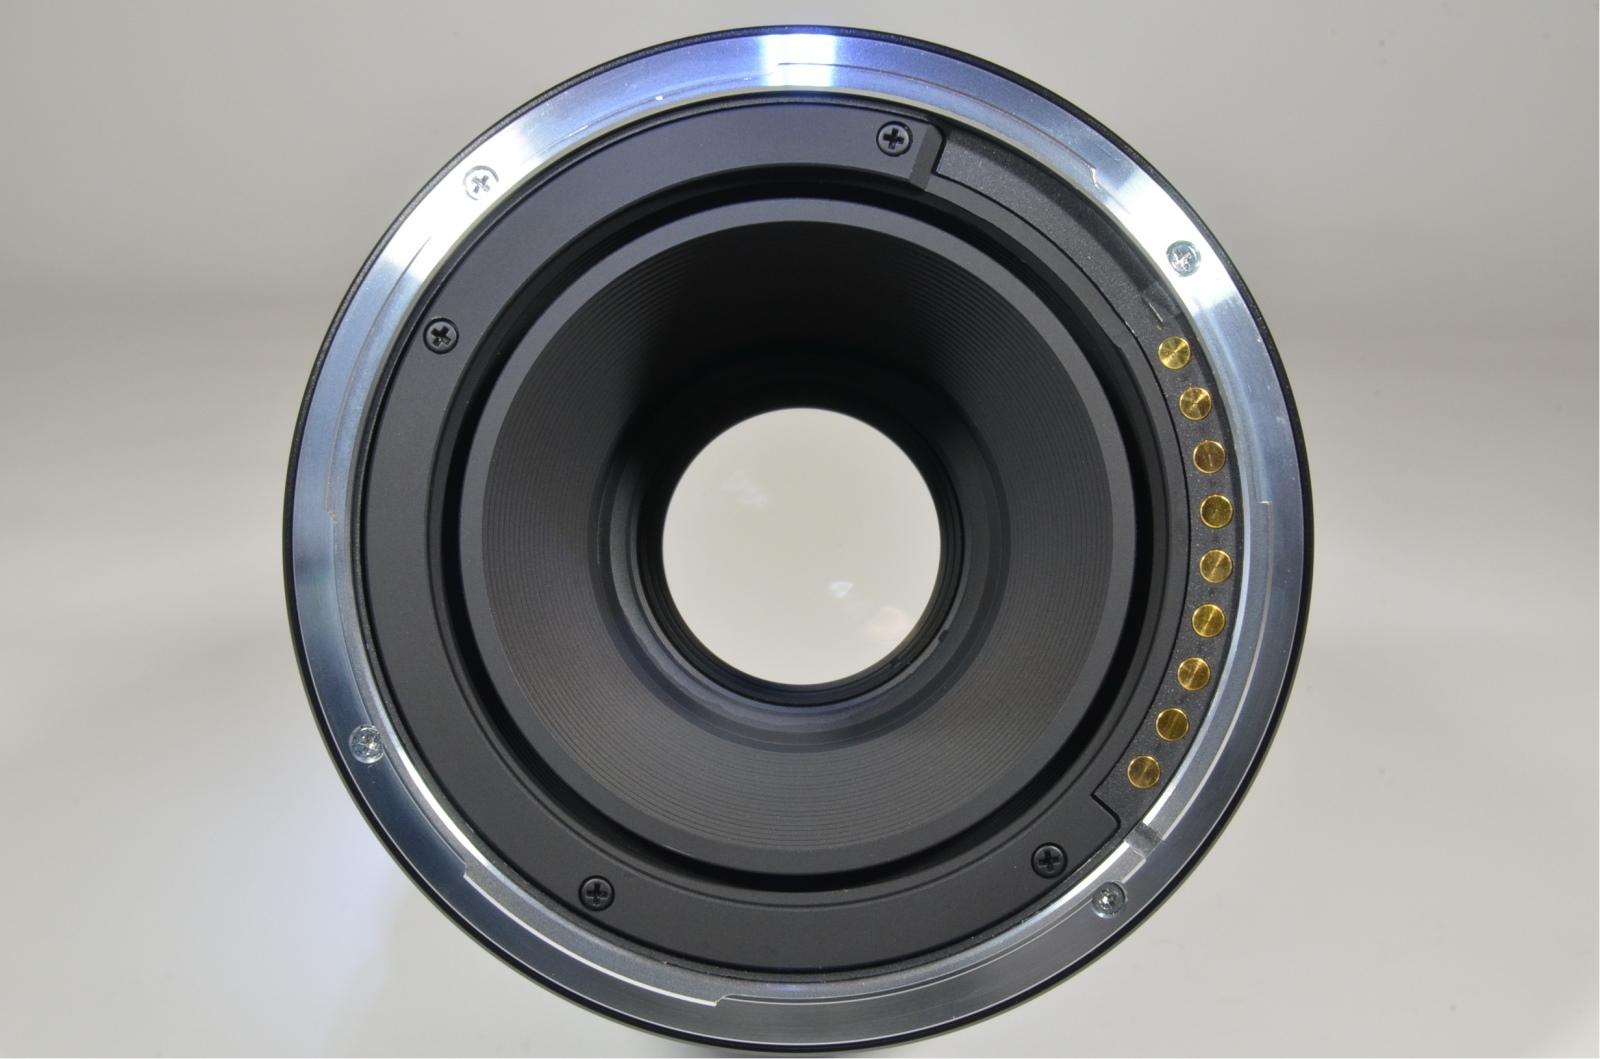 contax 645 carl zeiss apo makro planar t* 120mm f4